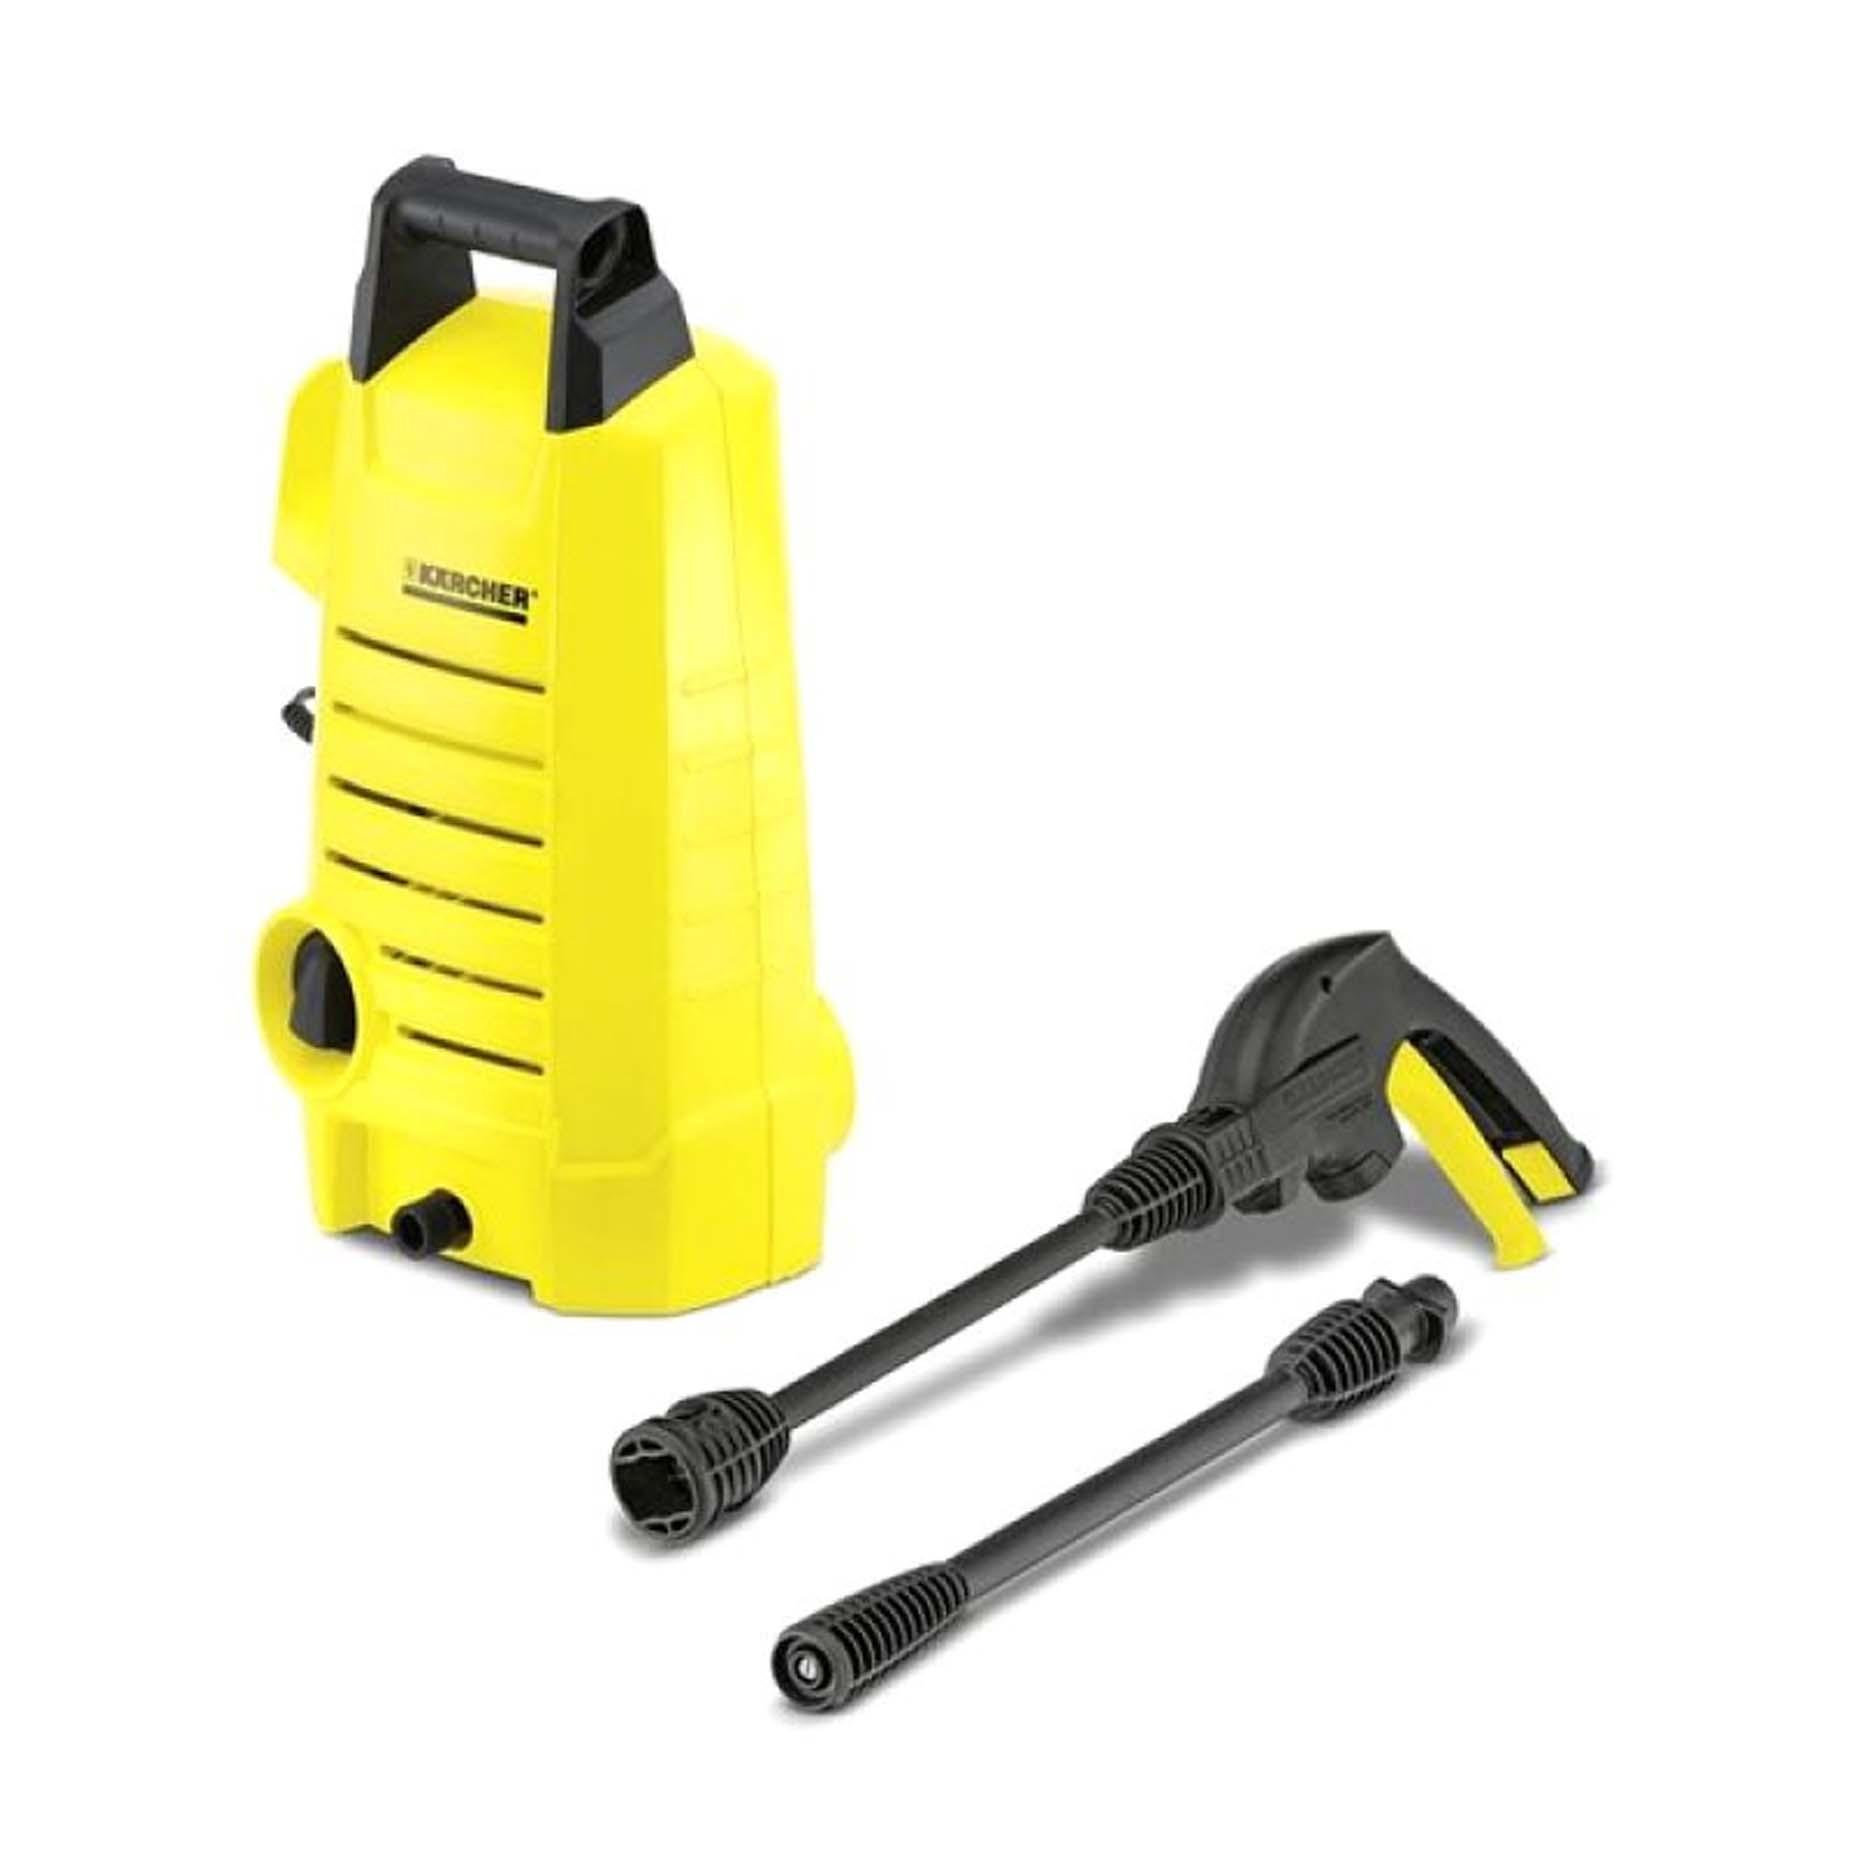 Jetech Tespen Listrik Digital 250 V8 Harga Terkini Dan Set Socket Krisbow Sq 1 2 10 32mm 26pcs Kw0101371 Karcher Ps590 K1 High Pressure Cleaner